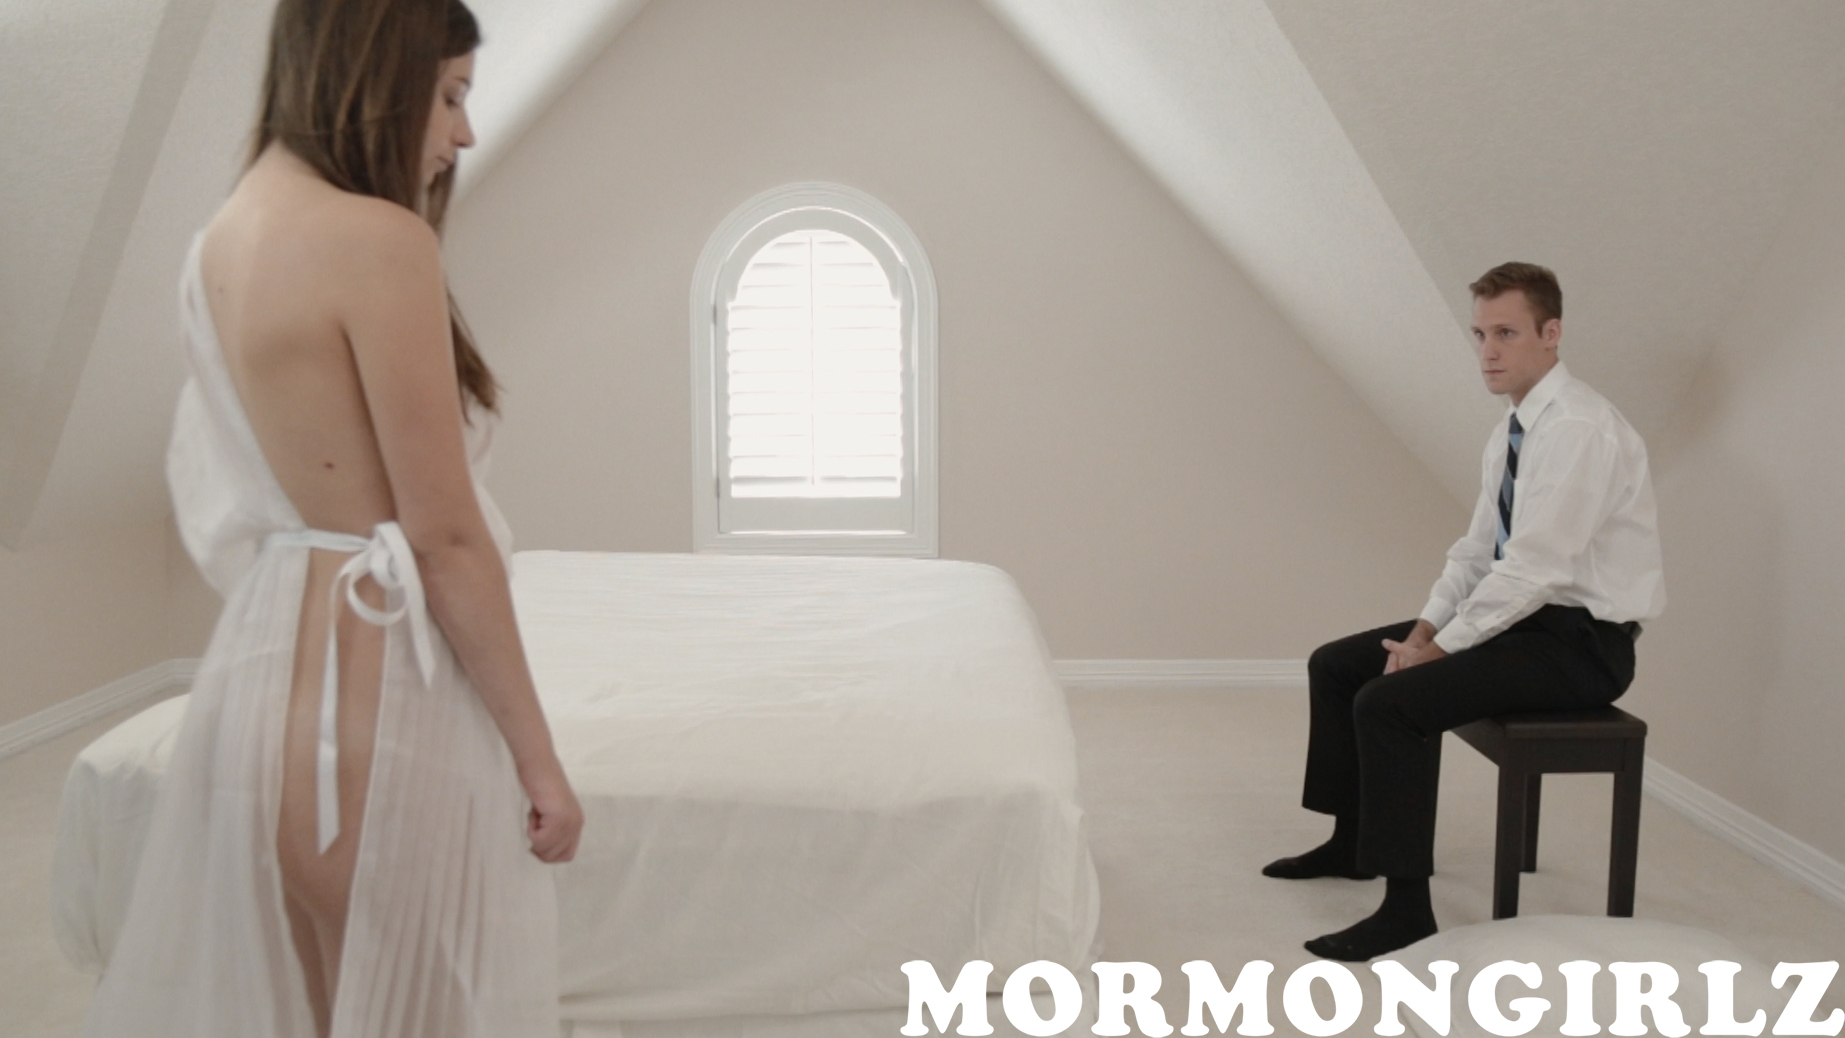 076_mormongirlz_0022